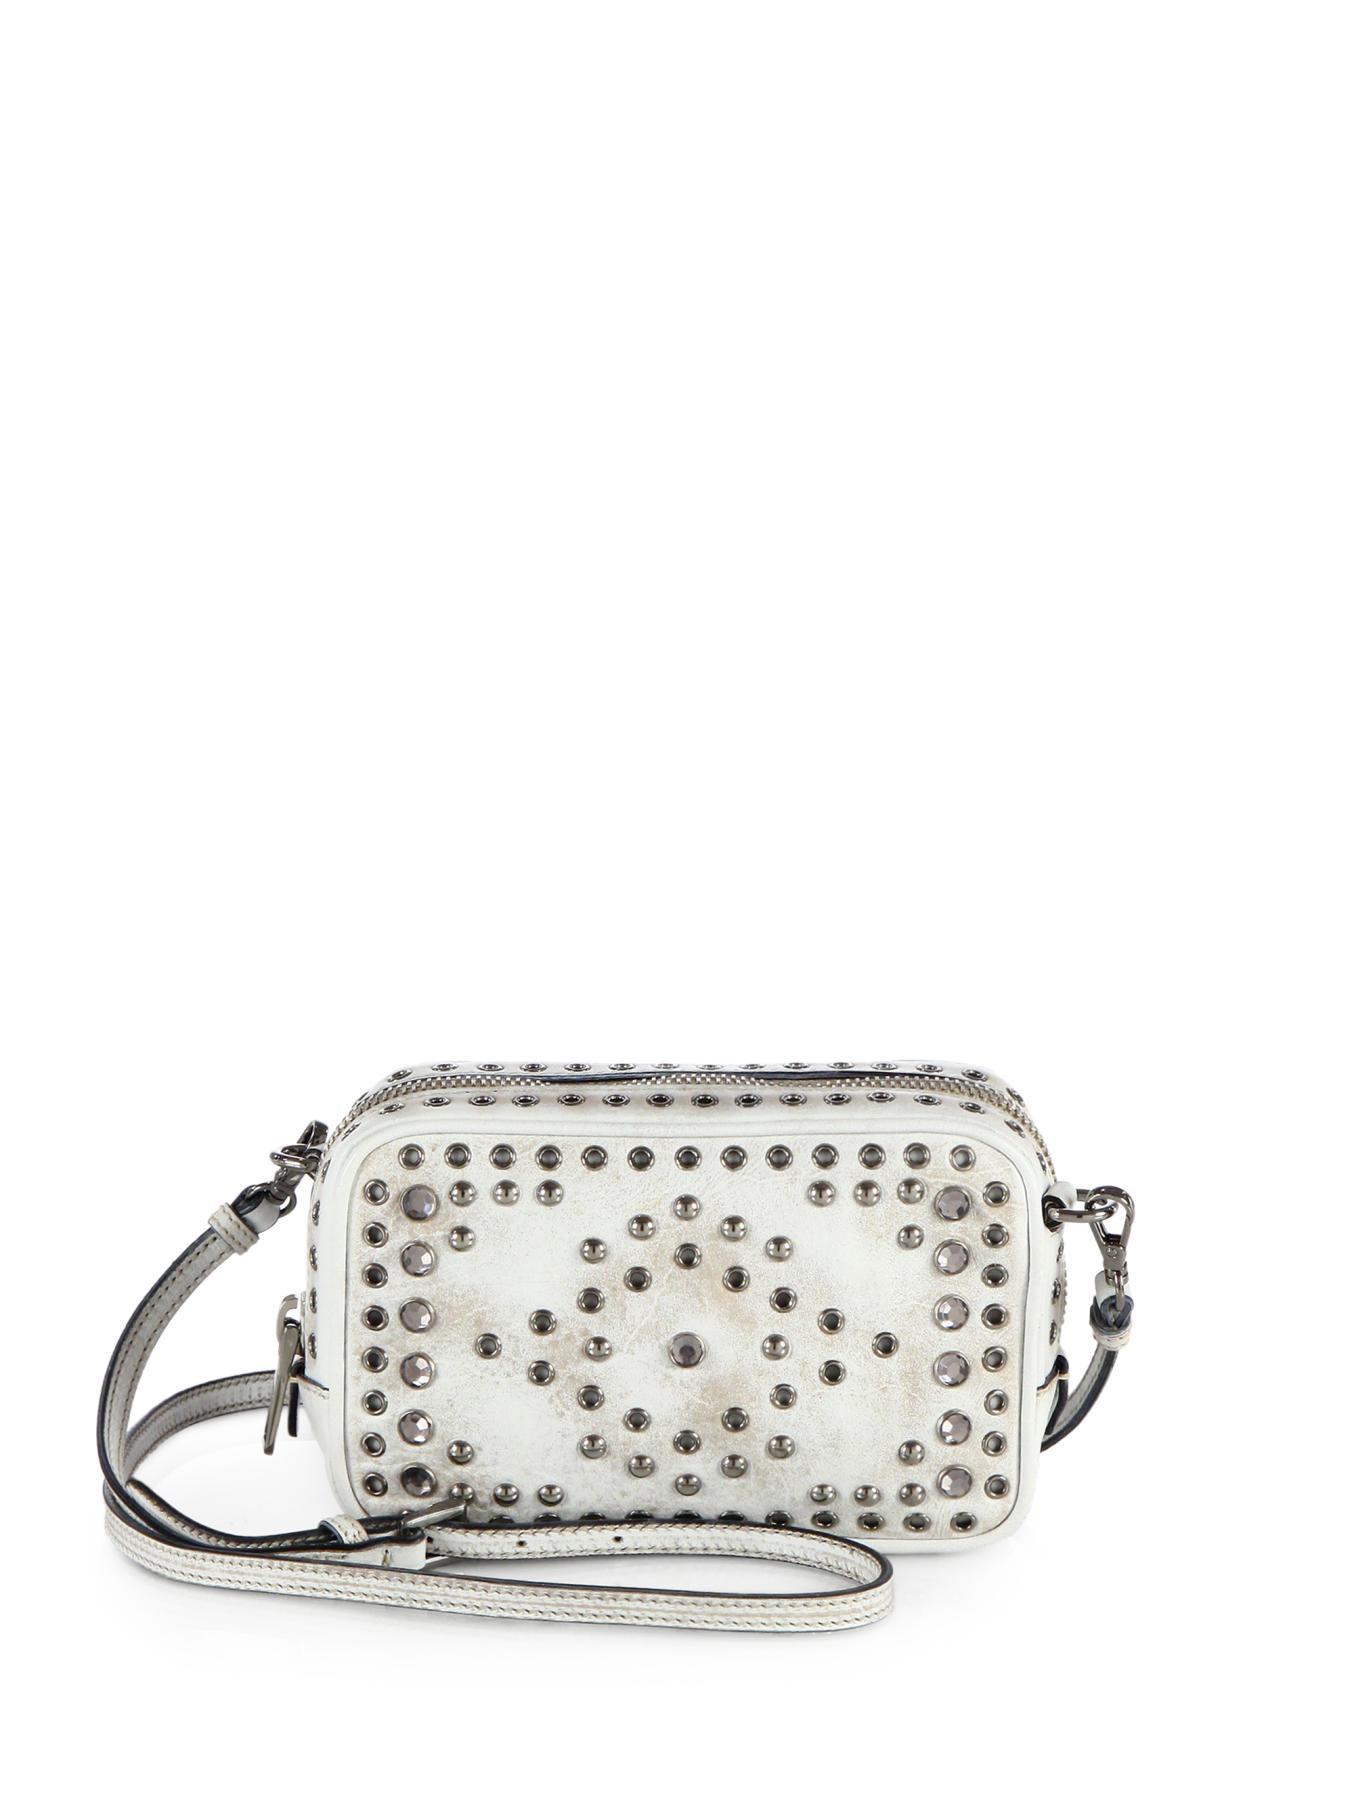 prada discount purses - Prada Vitello Vintage Embellished Camera Messenger Bag in Brown ...